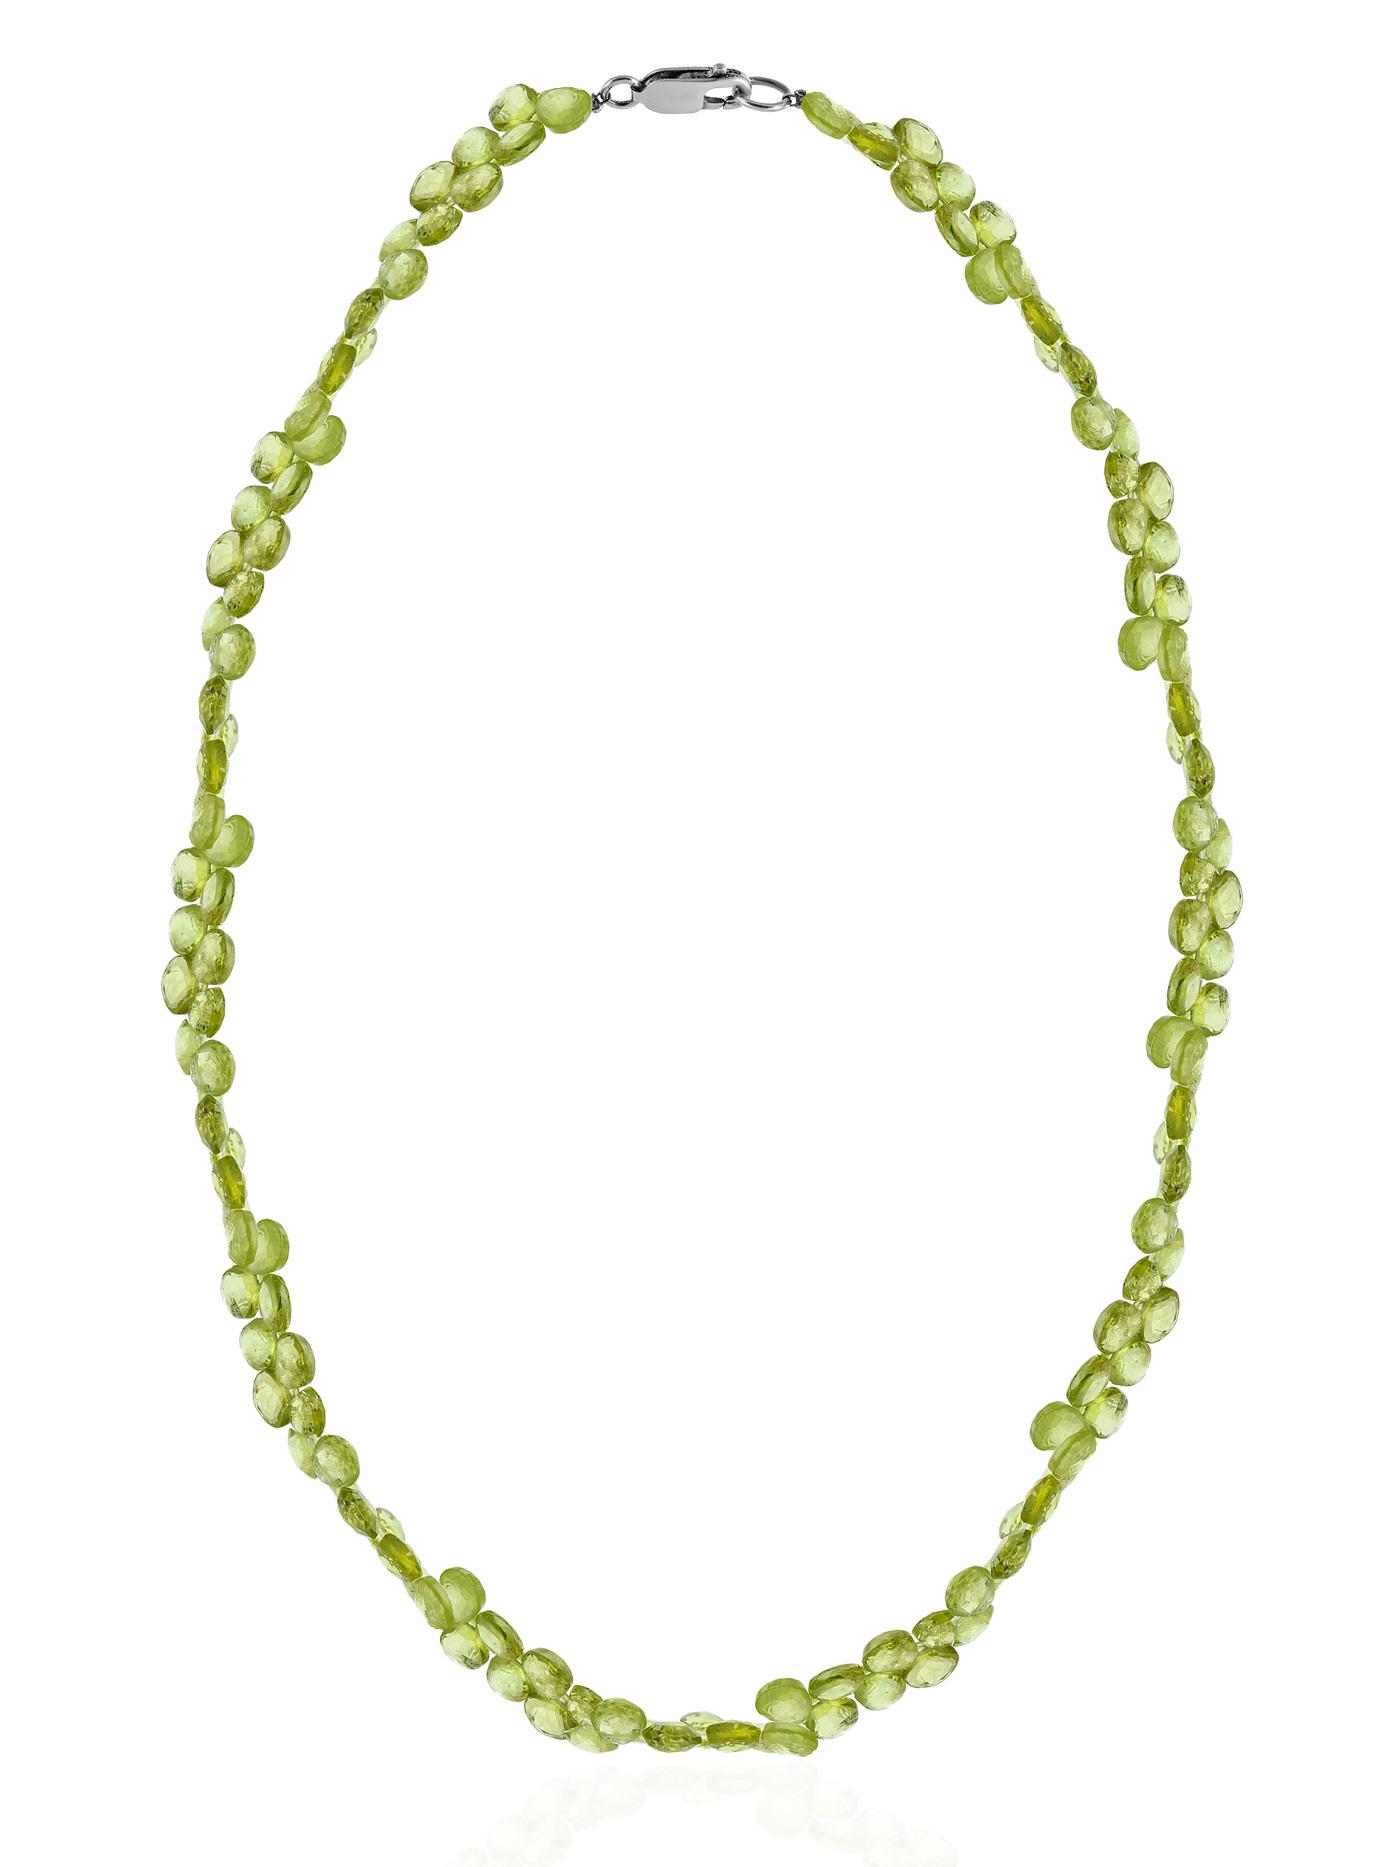 Колье из природного оливина (хризолита, перидота)